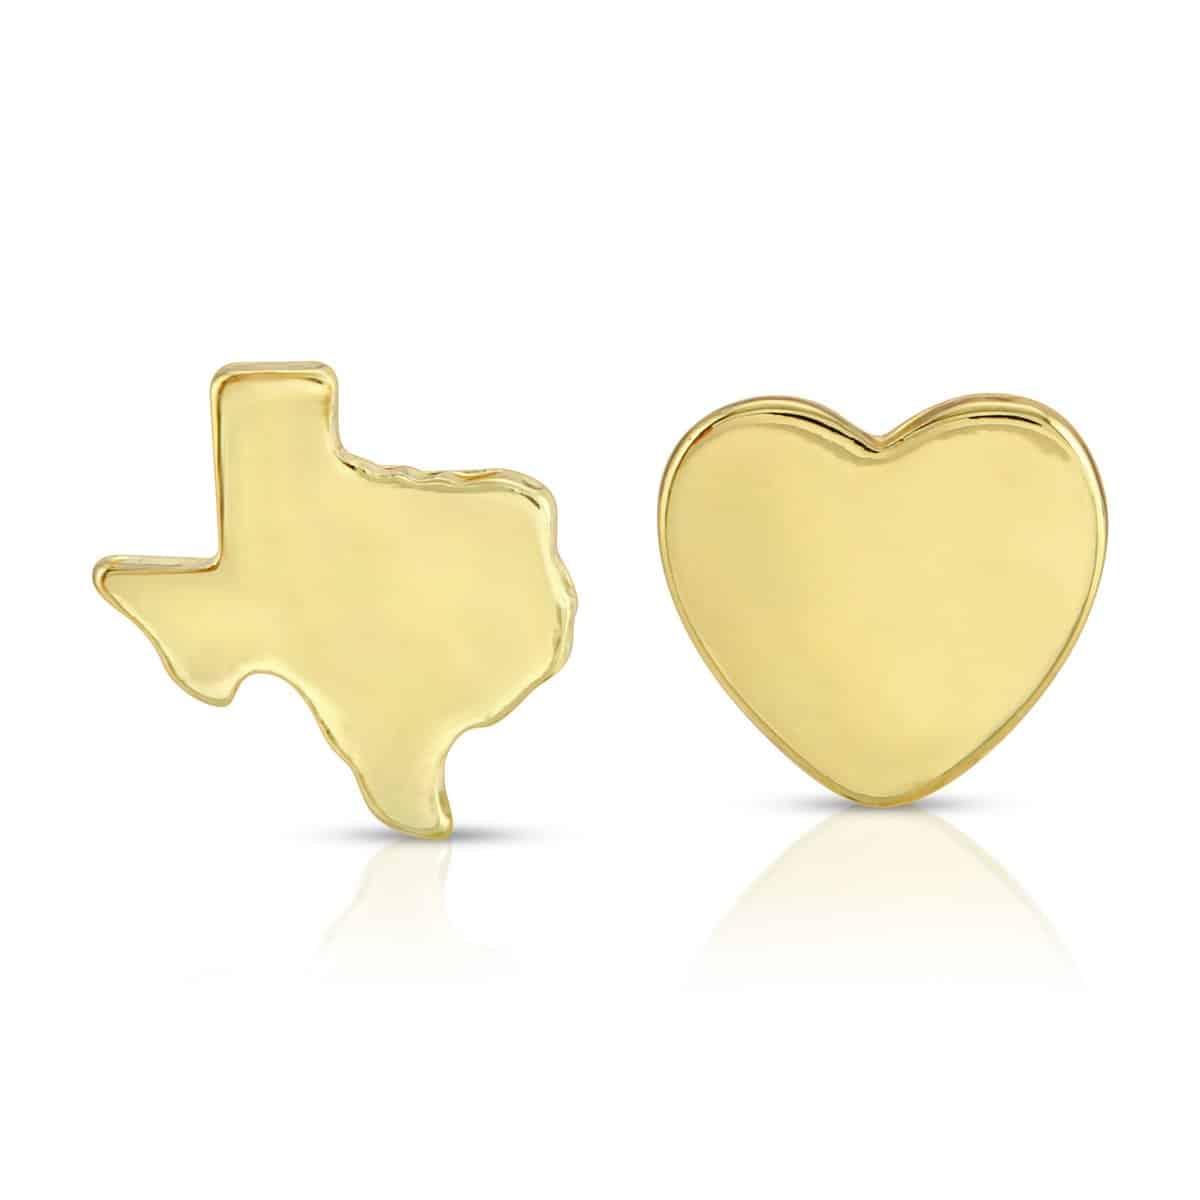 texas-gifts-earrings